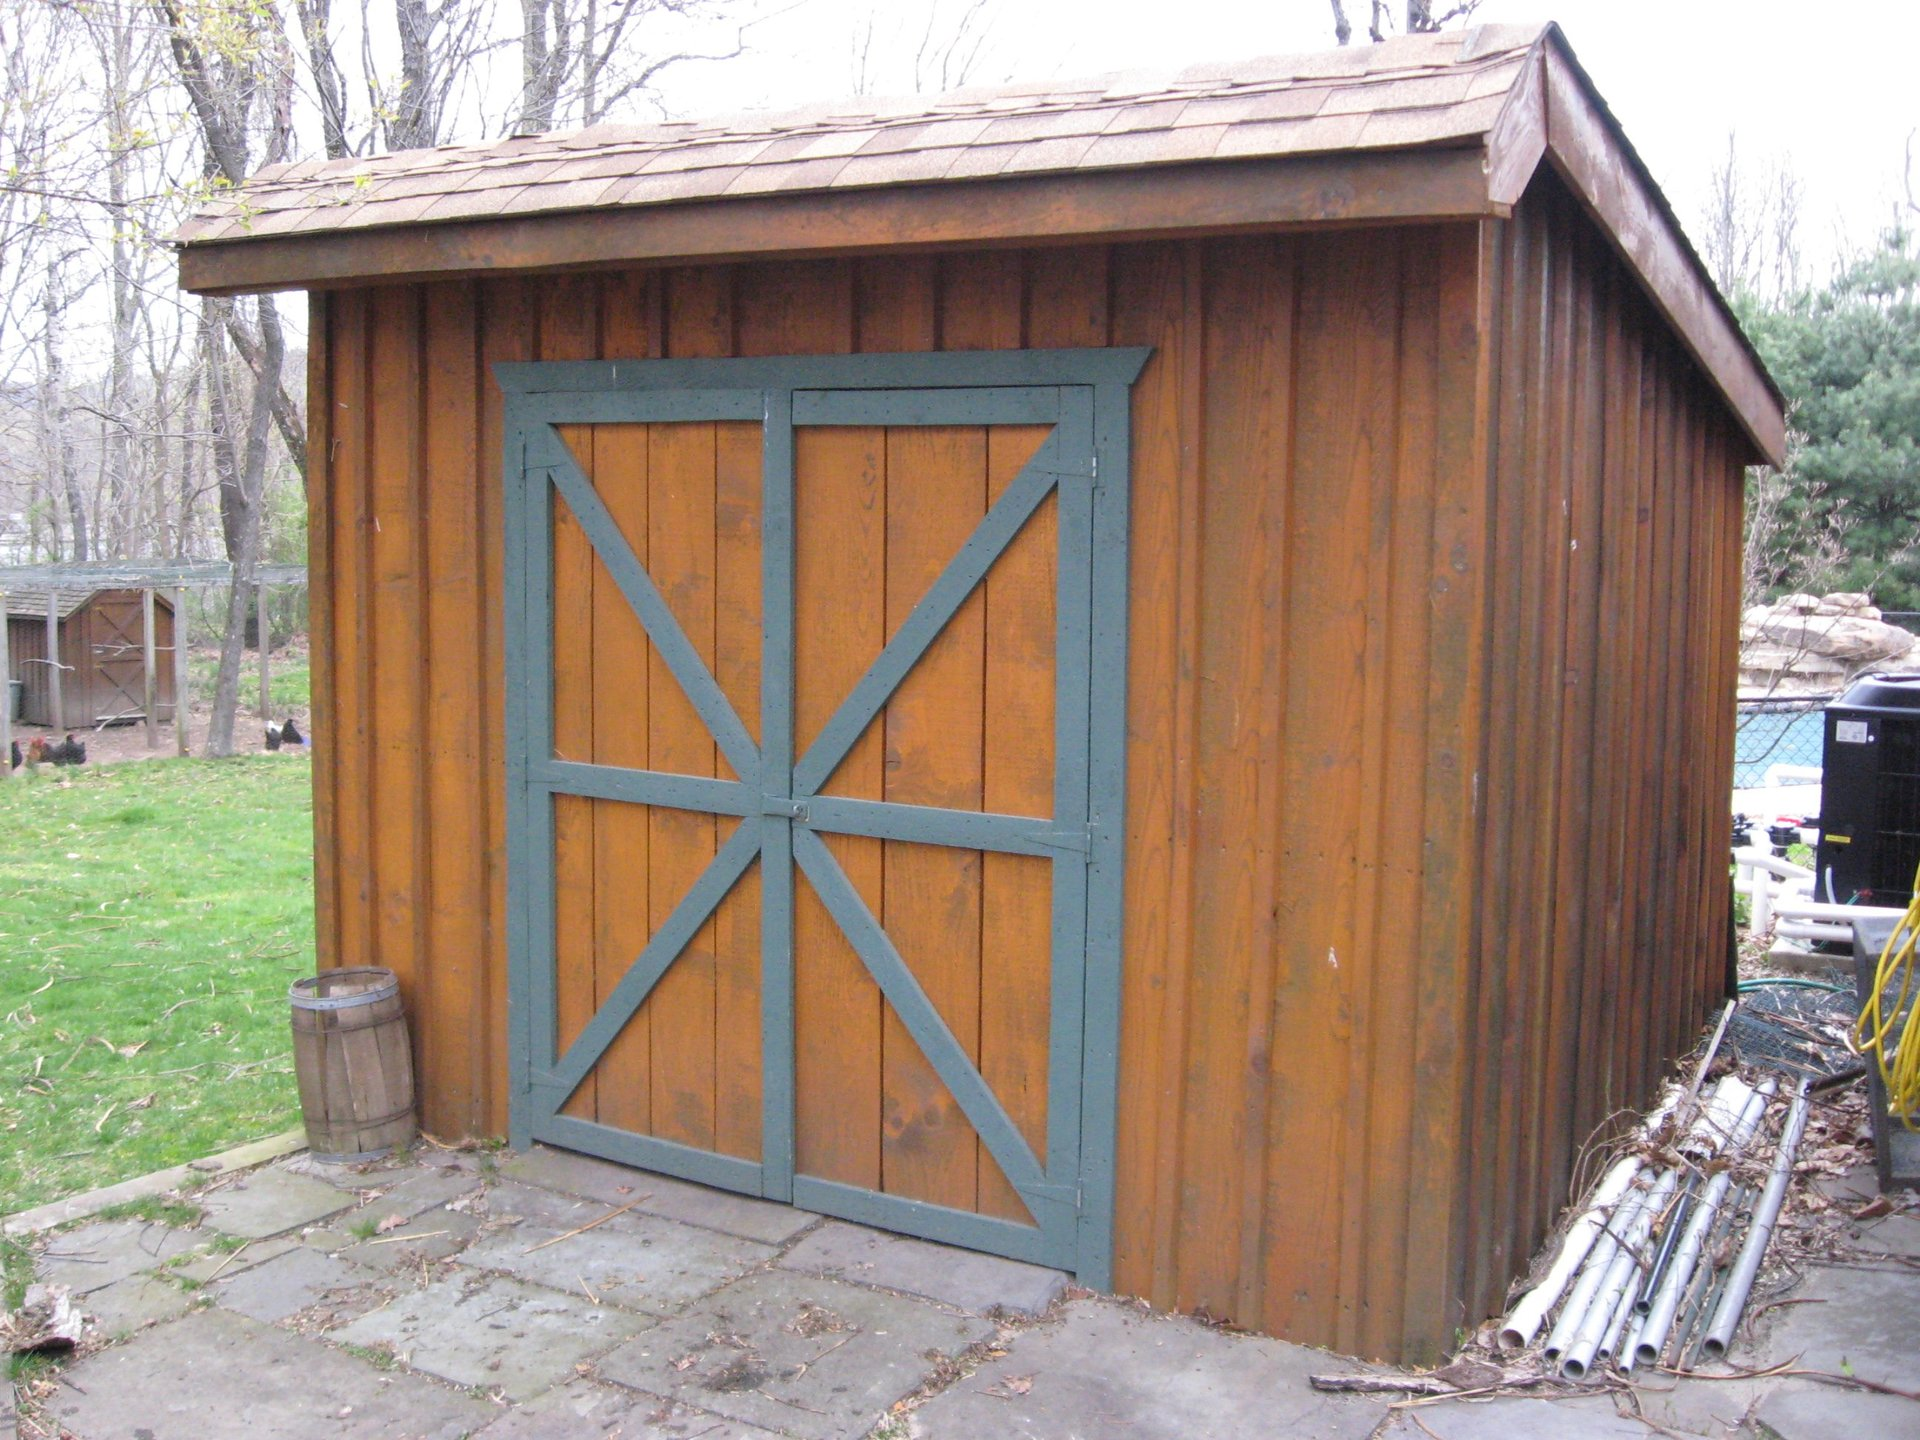 Fesco Fence Shed And Baby Barn Gallery West Nyack Ny